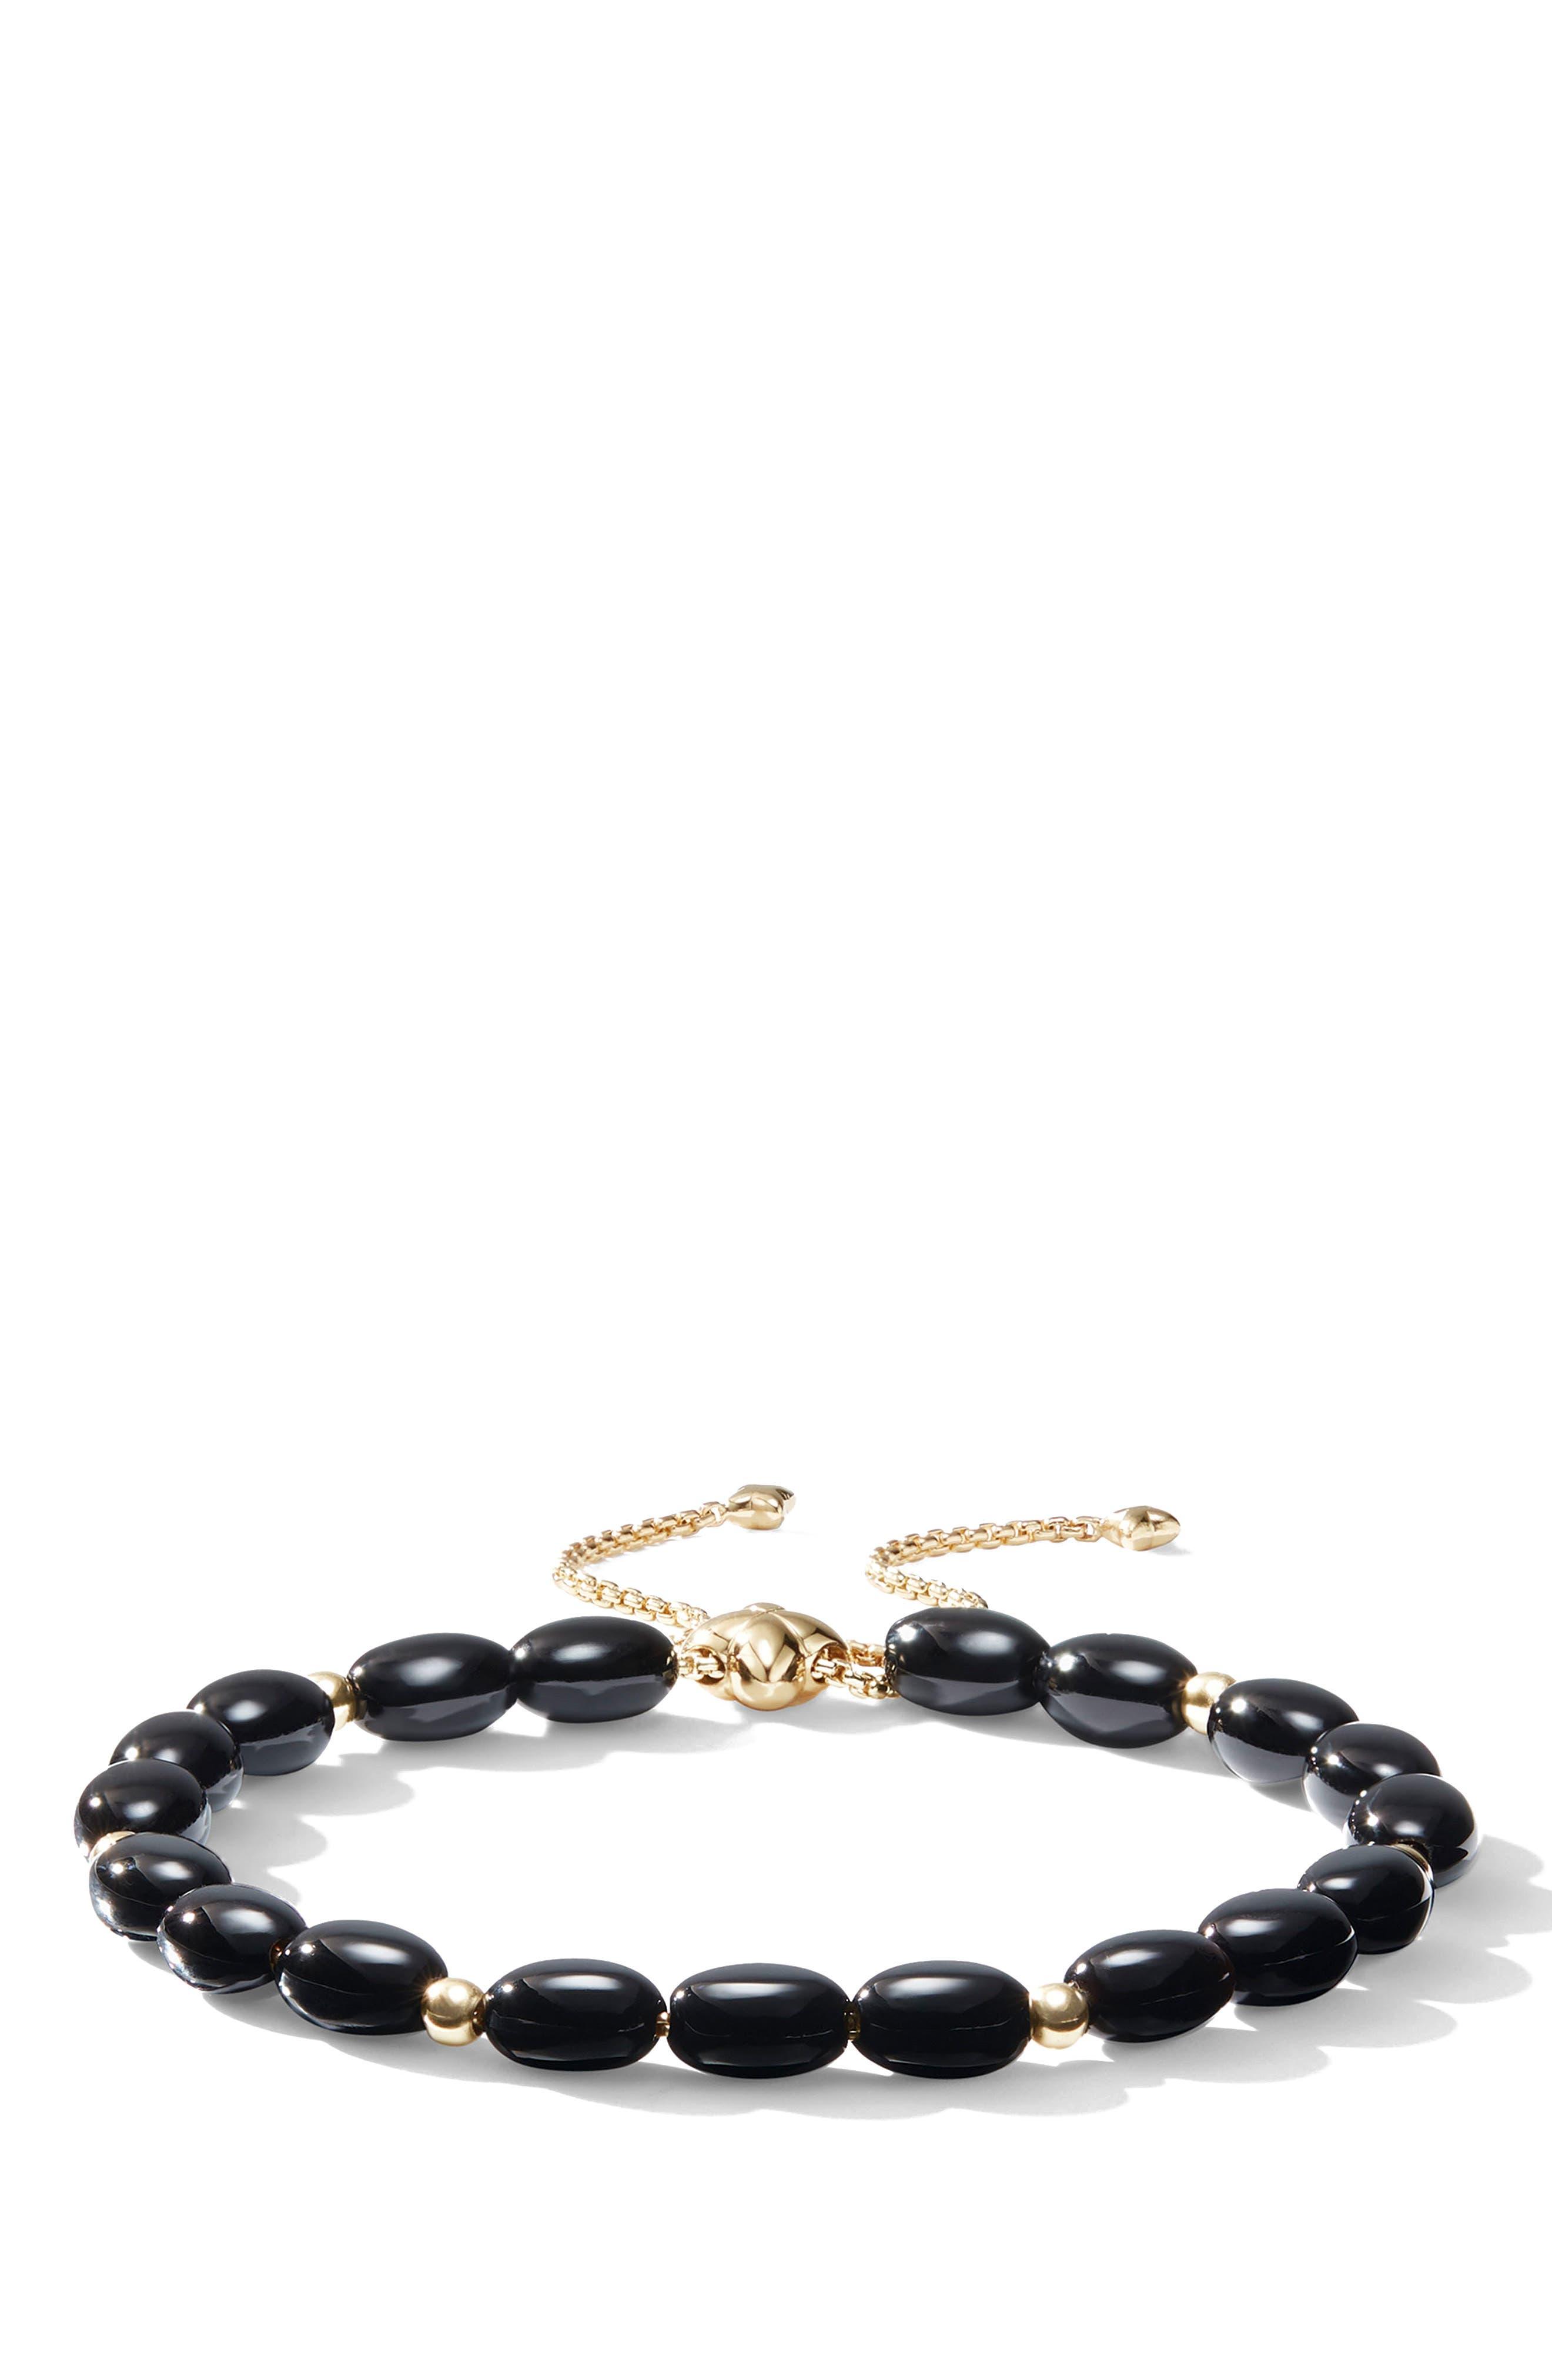 DAVID YURMAN Spiritual Bead Bracelet with 18k Gold, Main, color, BLACK ONYX